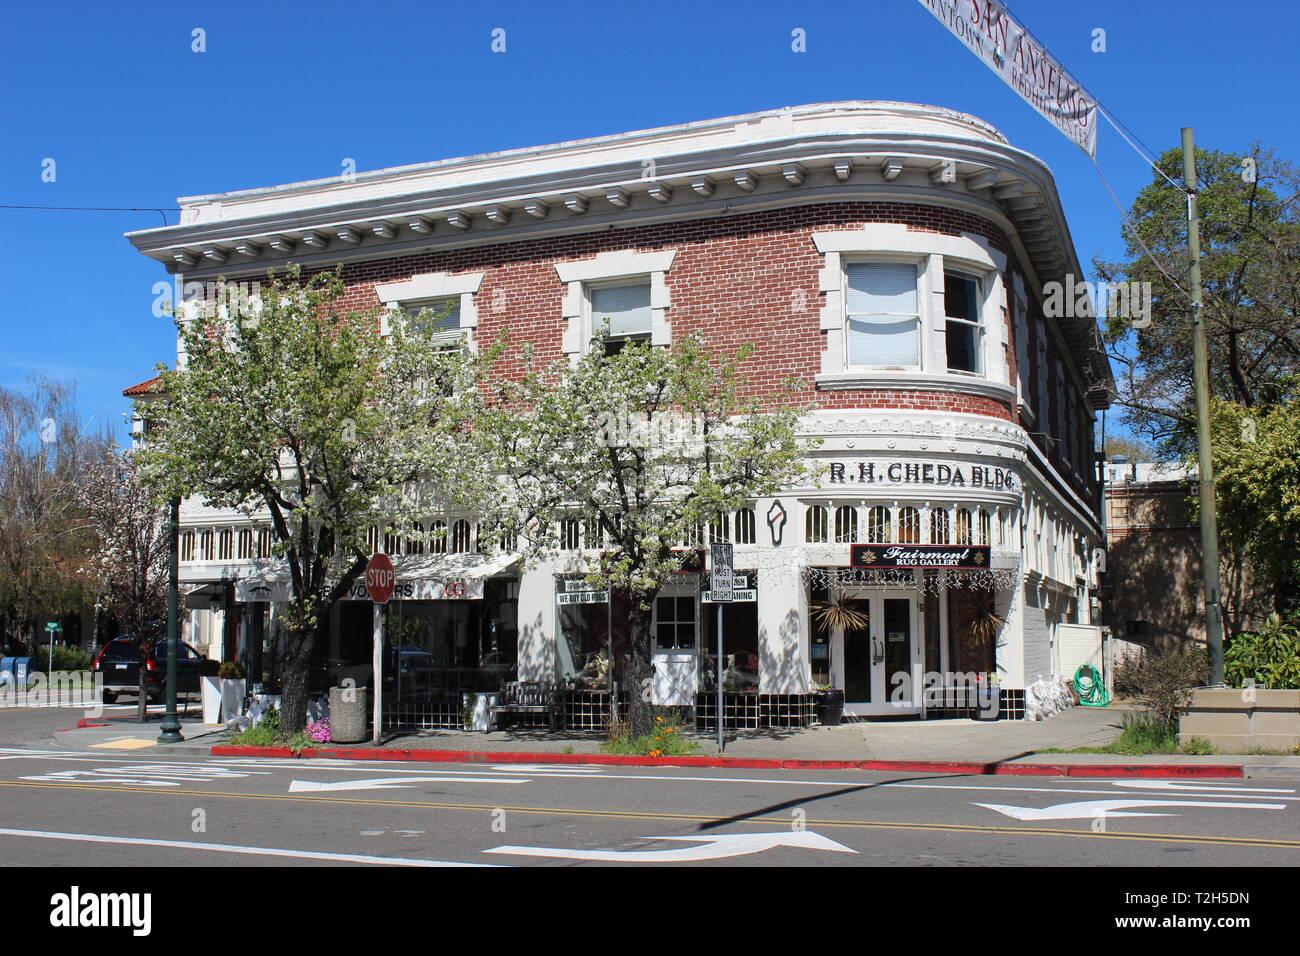 Cheda Building, San Anselmo, California - Stock Image